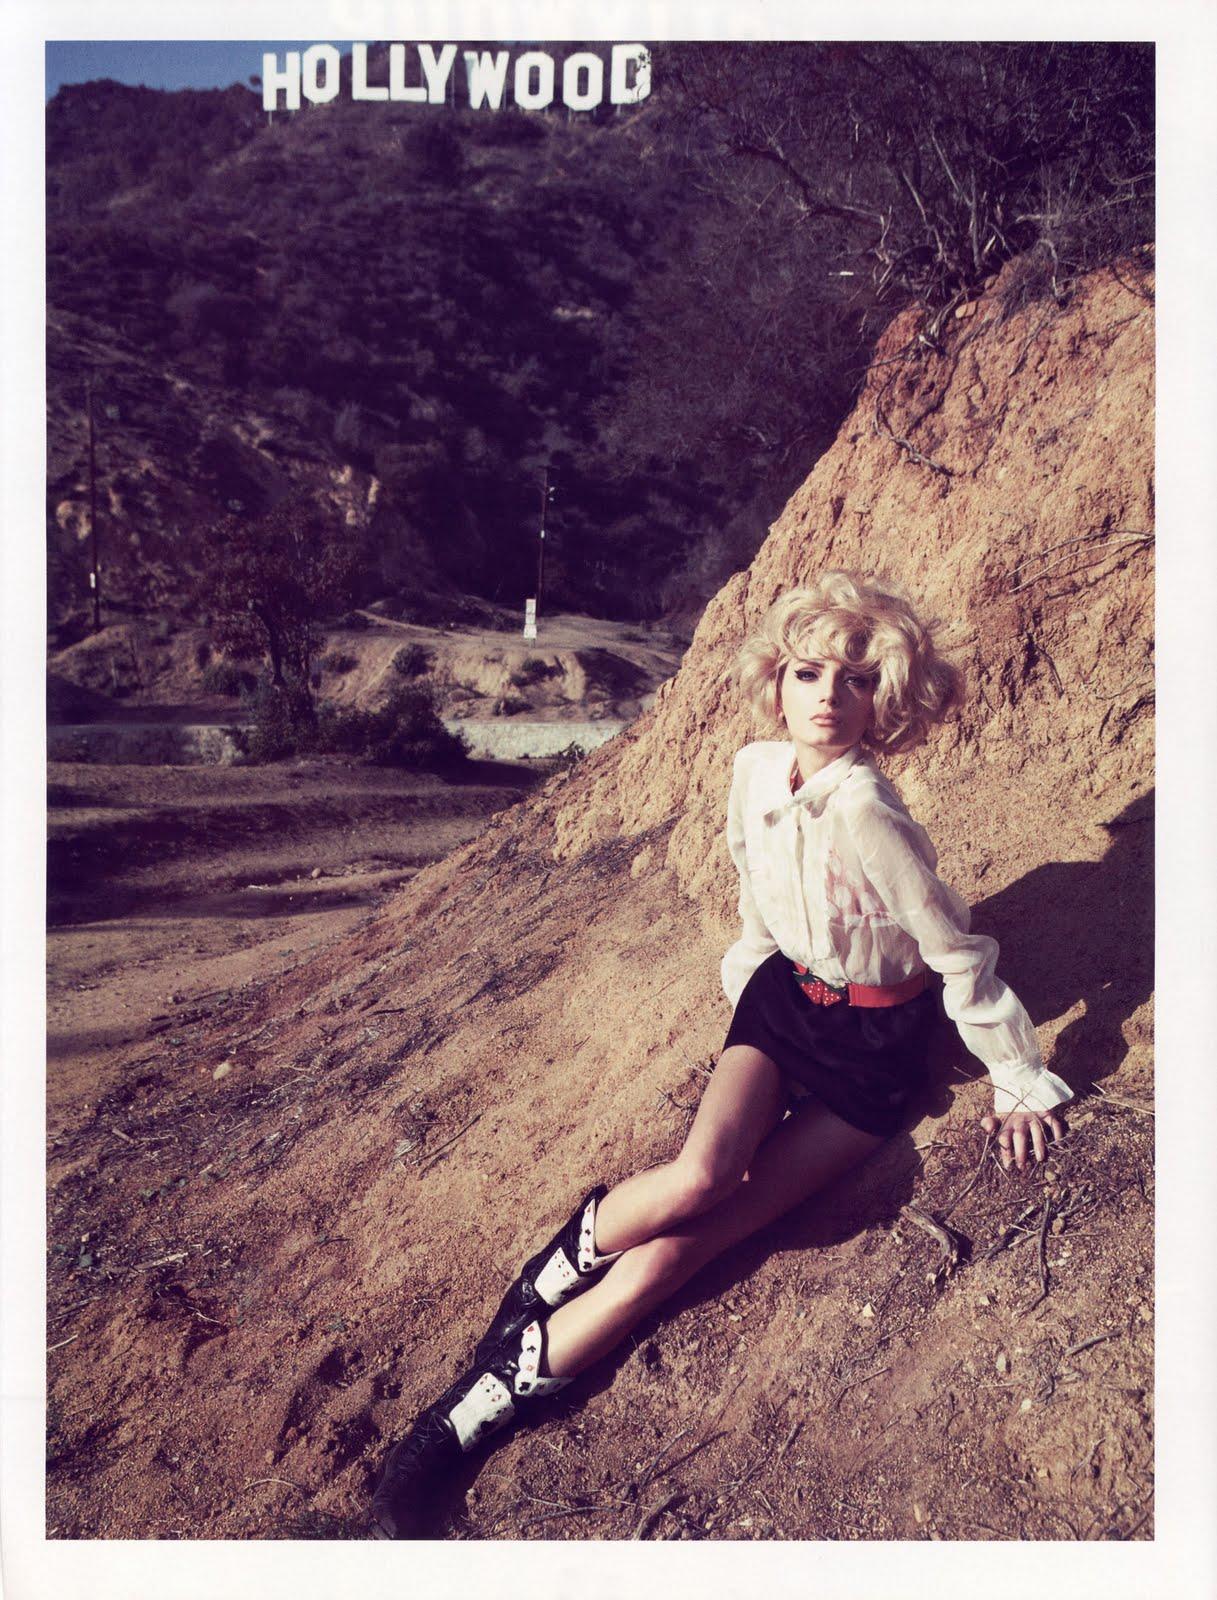 http://1.bp.blogspot.com/_bq6_cE4BJJQ/TCtRCsoFbYI/AAAAAAAAZrI/c9Cl1cOfWnY/s1600/Inez+Van+Lamsweerde+%26+Vinoodh+Matadin+%C3%97+Lily+Donaldson+-+Vogue+Paris+February+2008+-+American+DREAM+-+003.jpg